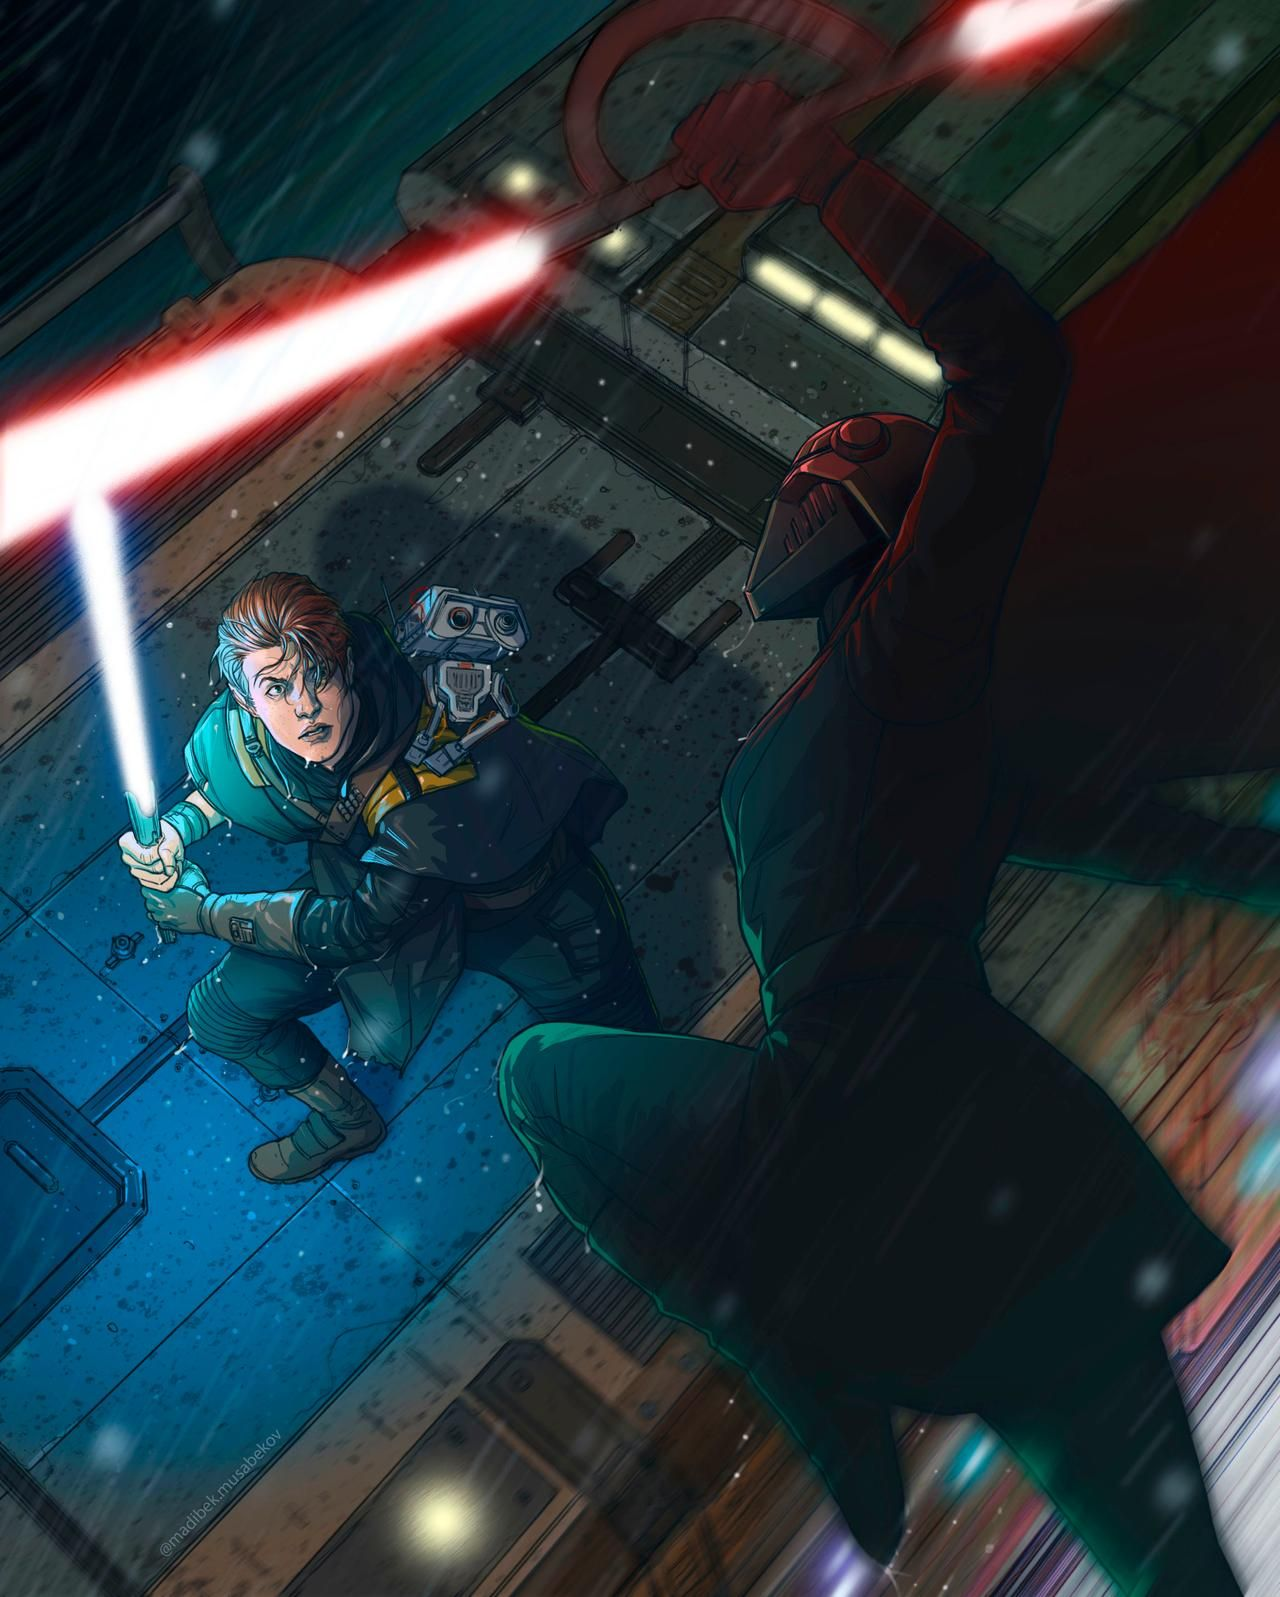 Star Wars Jedi Fallen Order Lightsaber [1920x1080] Star